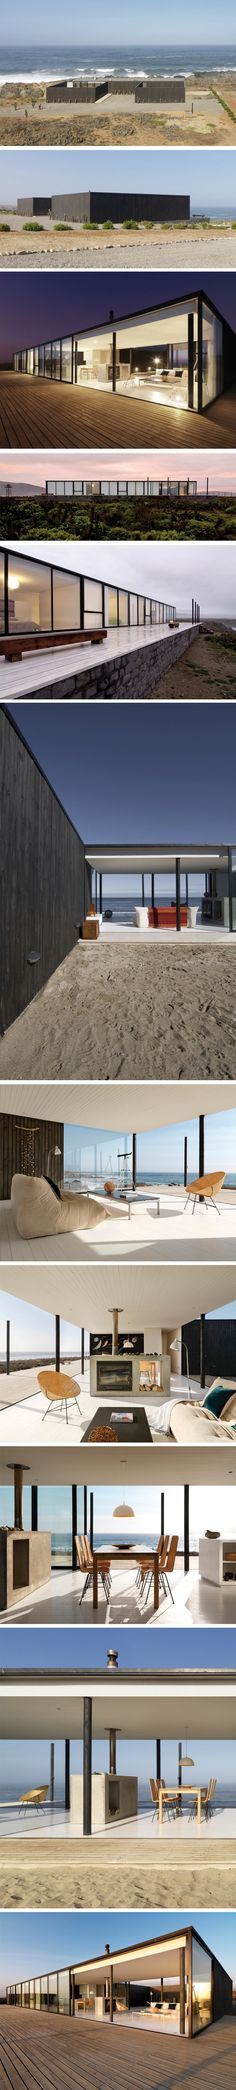 Casa W by 01ARQ, Chile